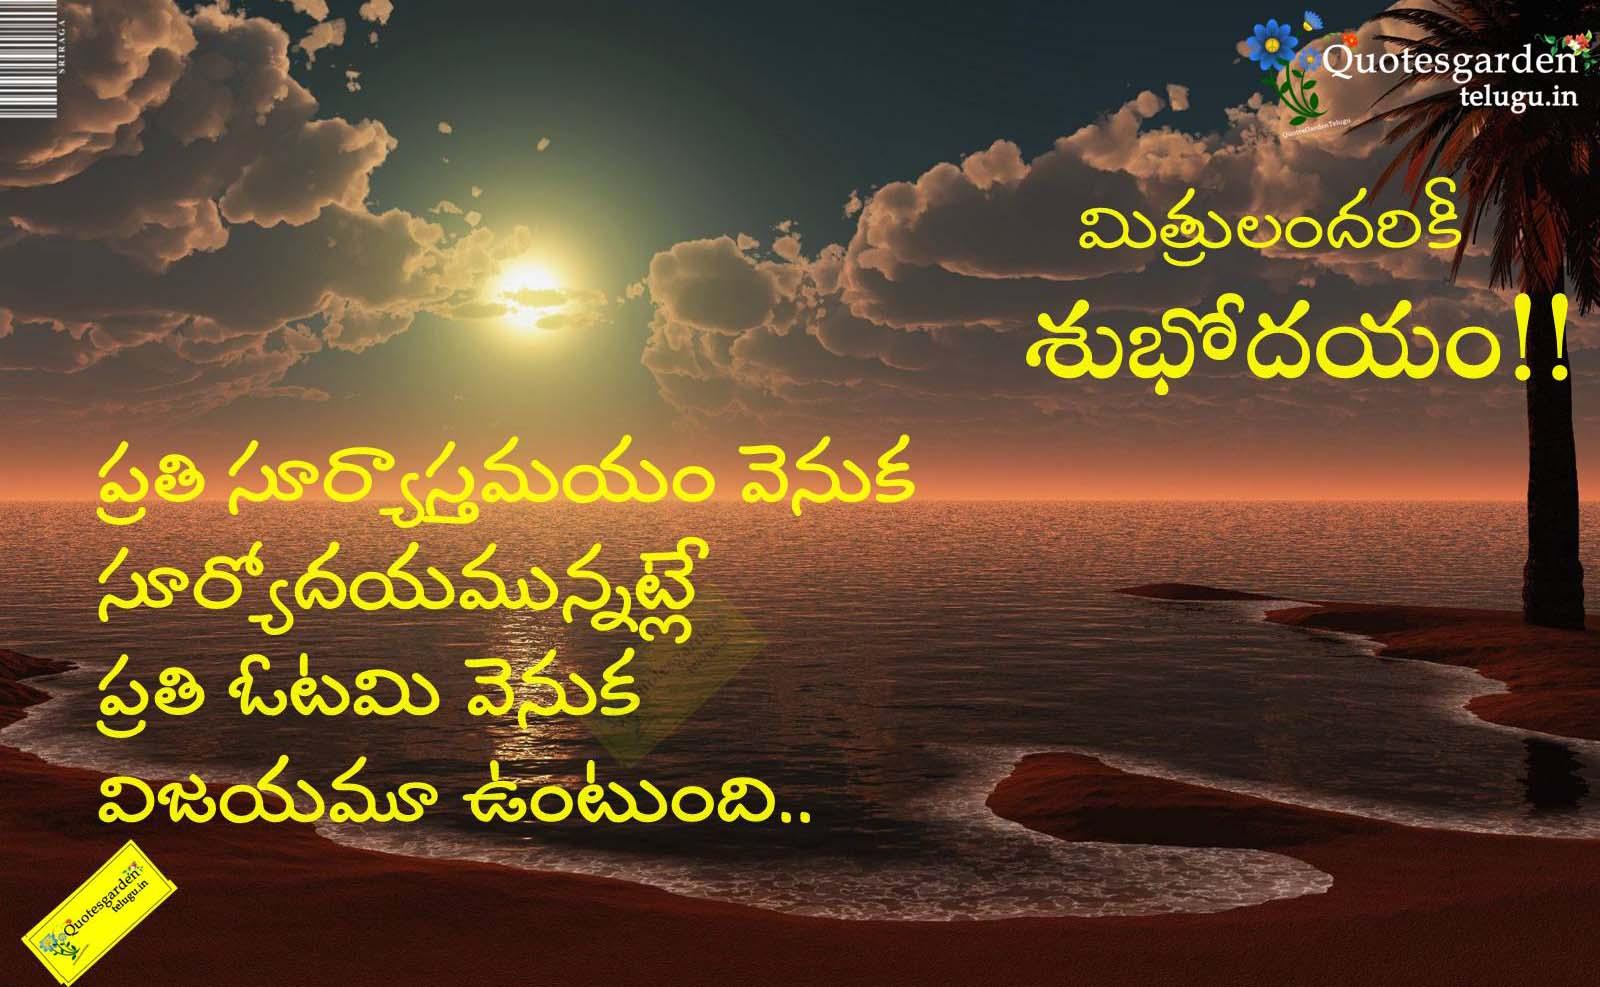 Inspirational Good Night Quotes In Telugu